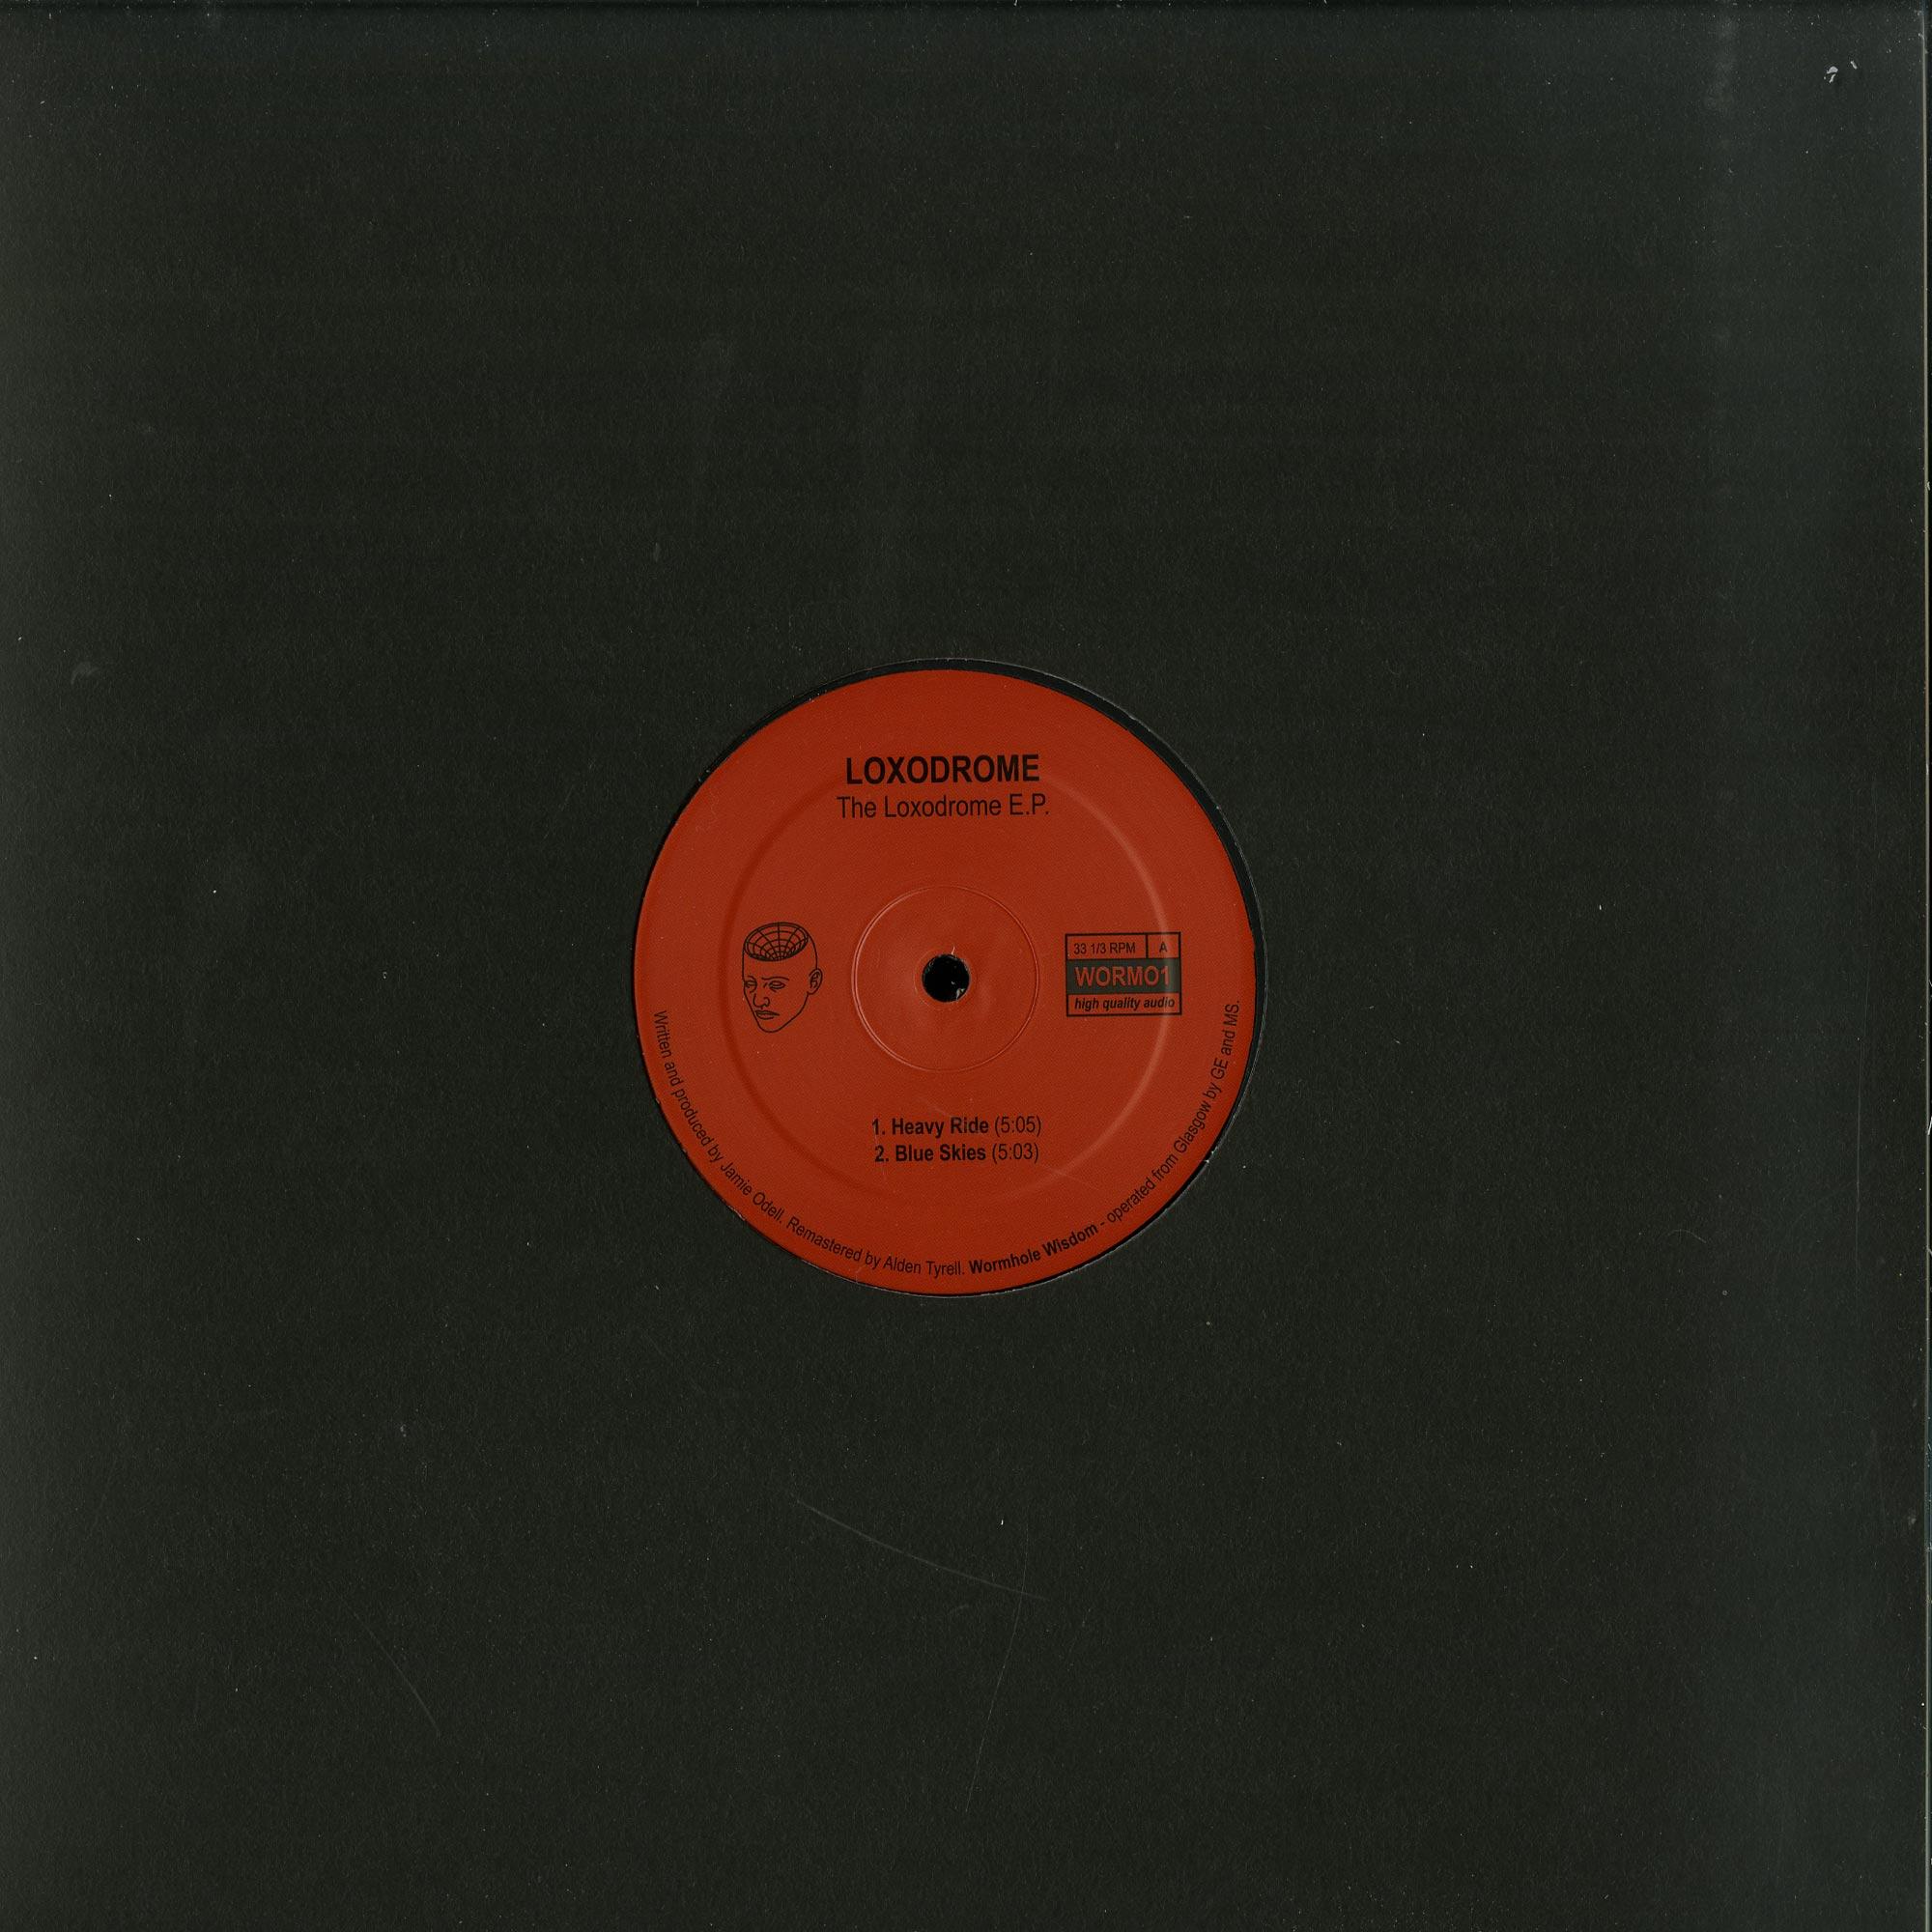 Loxodrome - THE LOXODROME EP